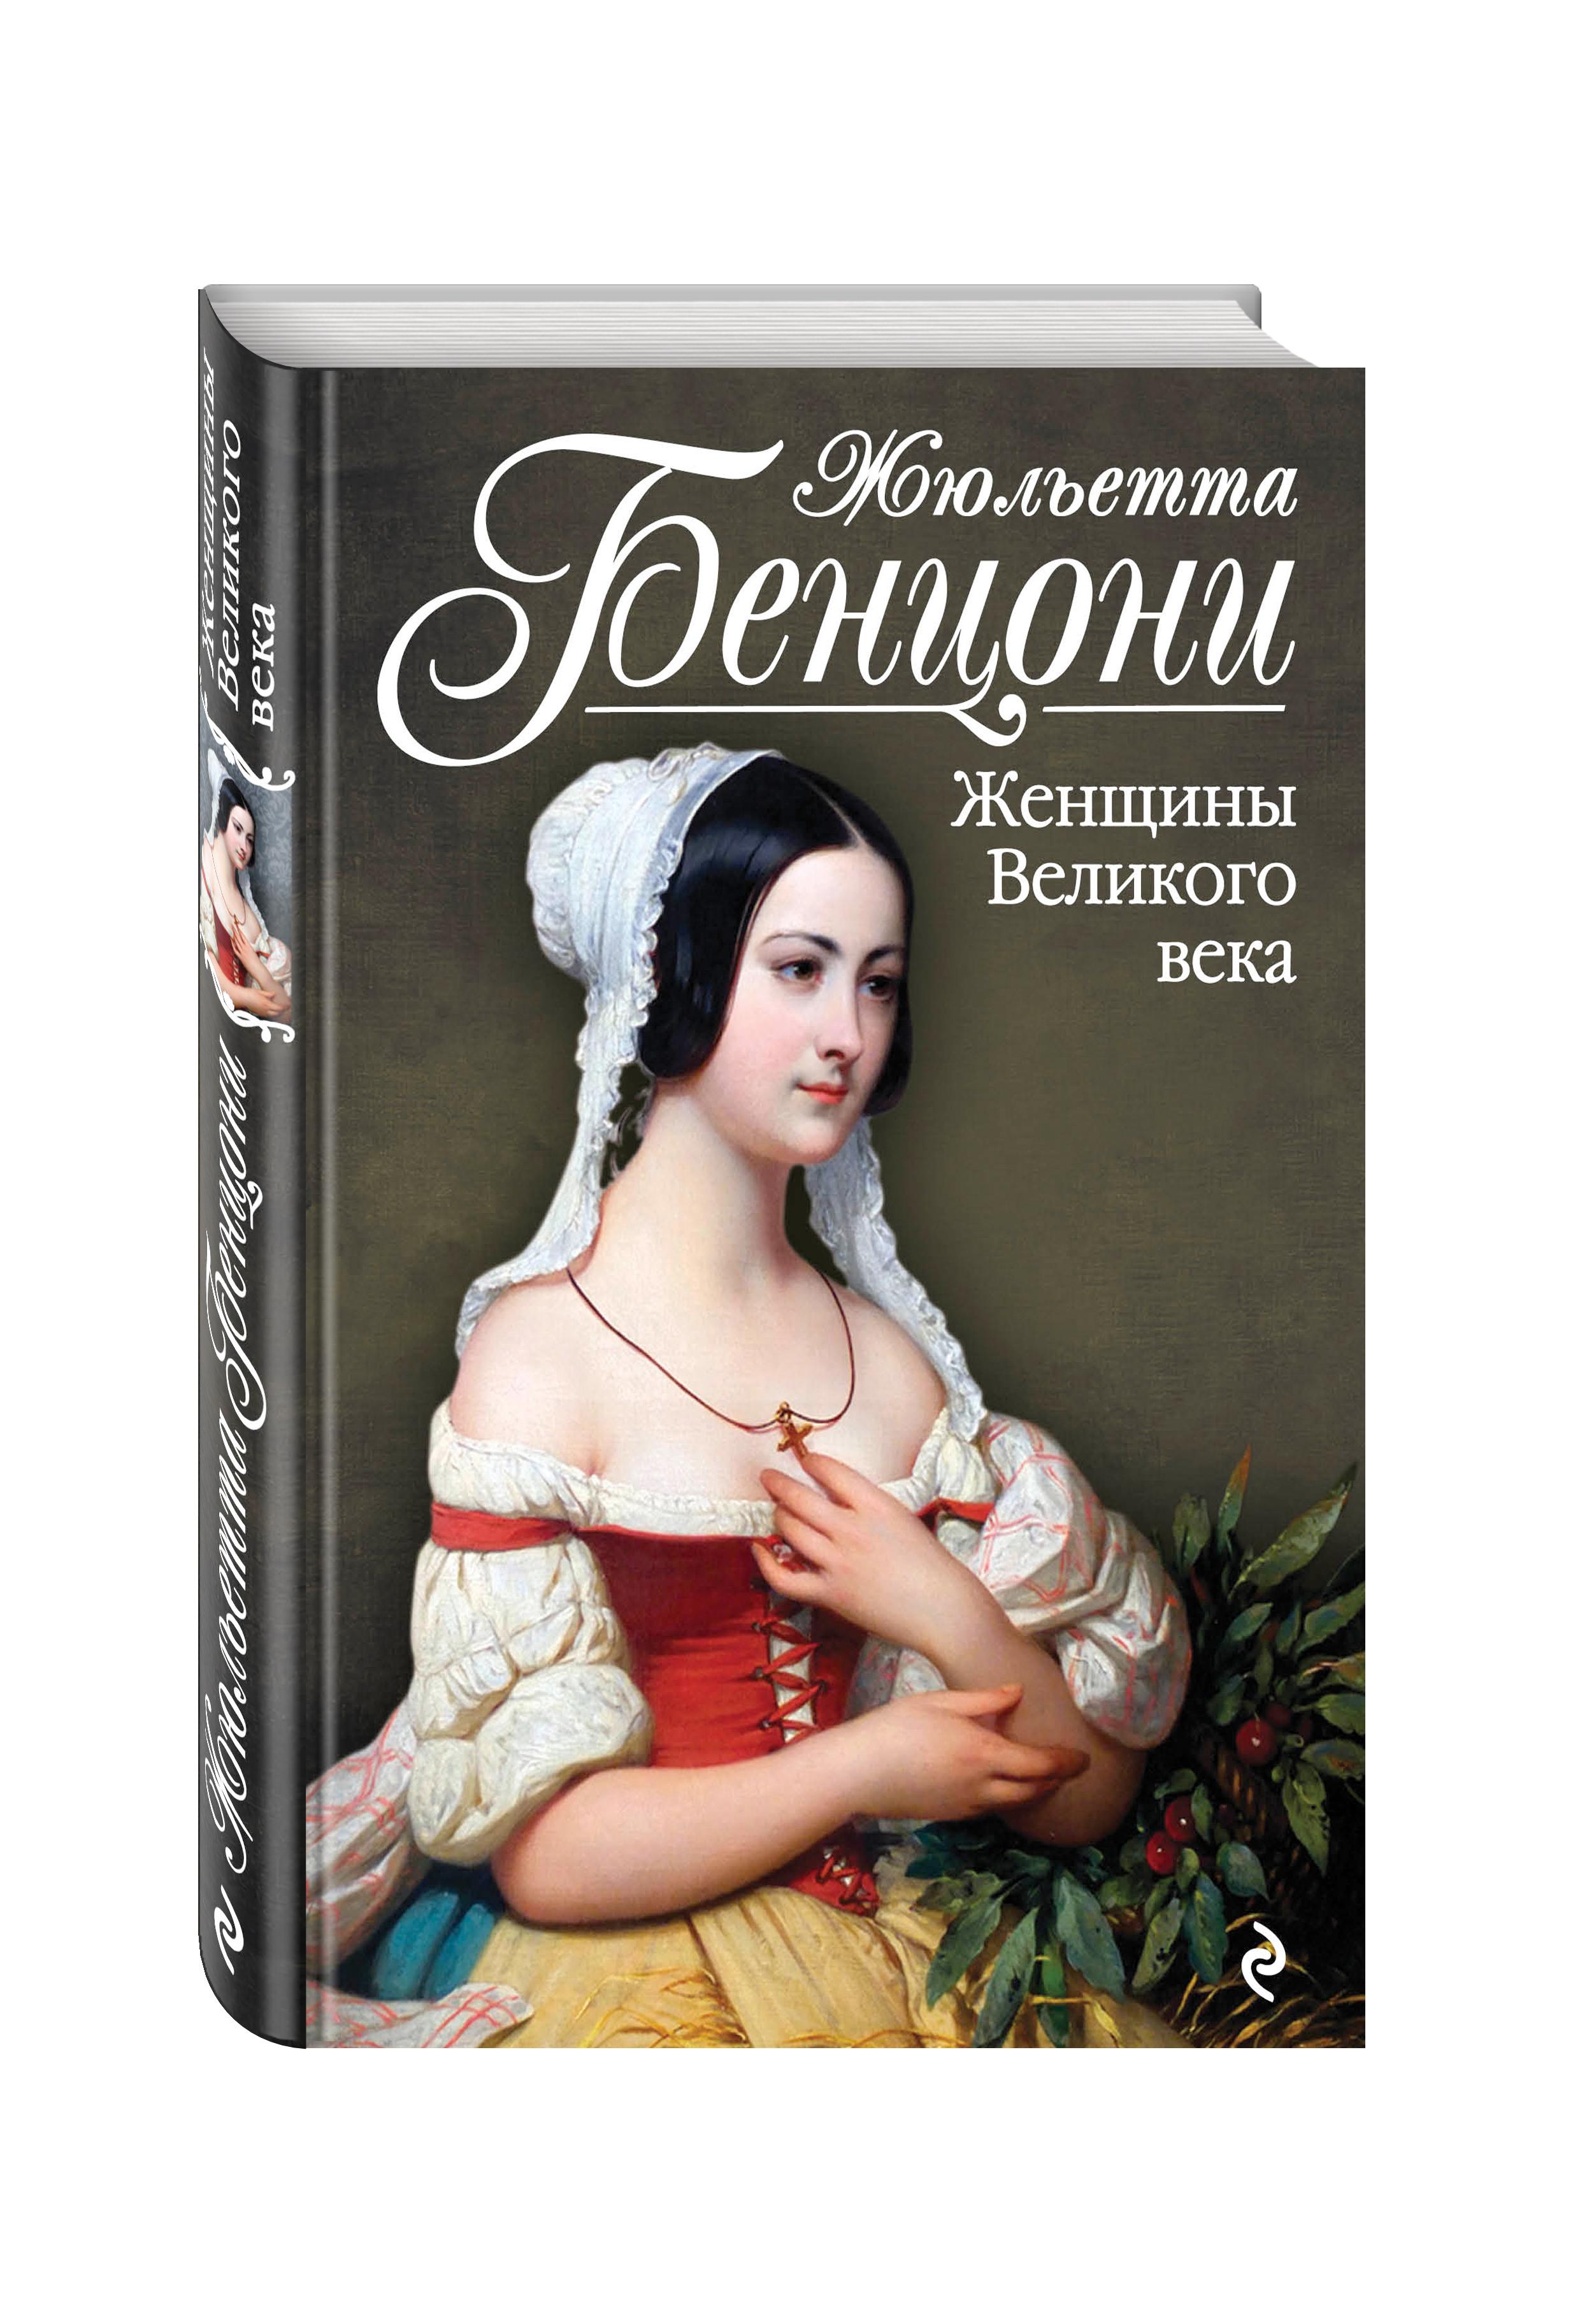 Бенцони Ж. Женщины Великого века бенцони жюльетта талисман отчаянных